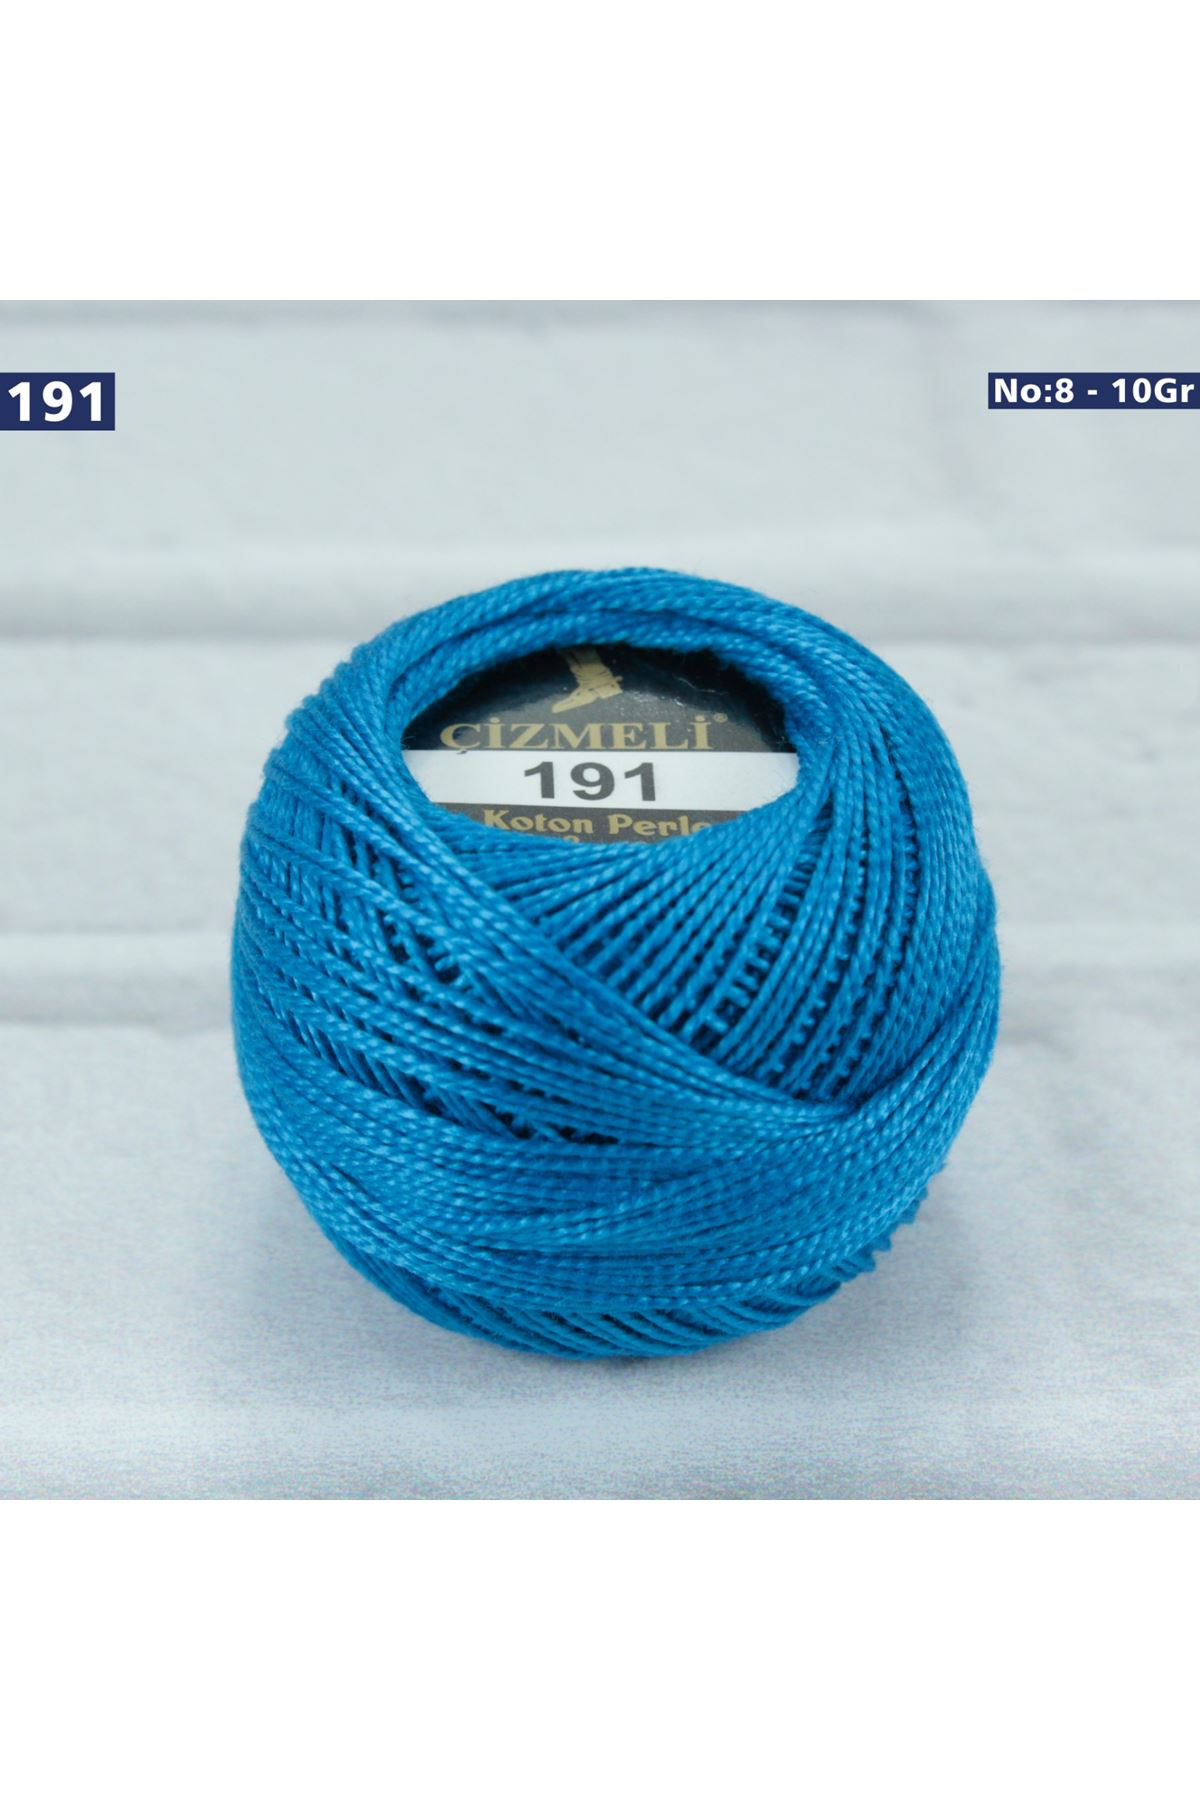 Çizmeli Cotton Perle Nakış İpliği No: 191